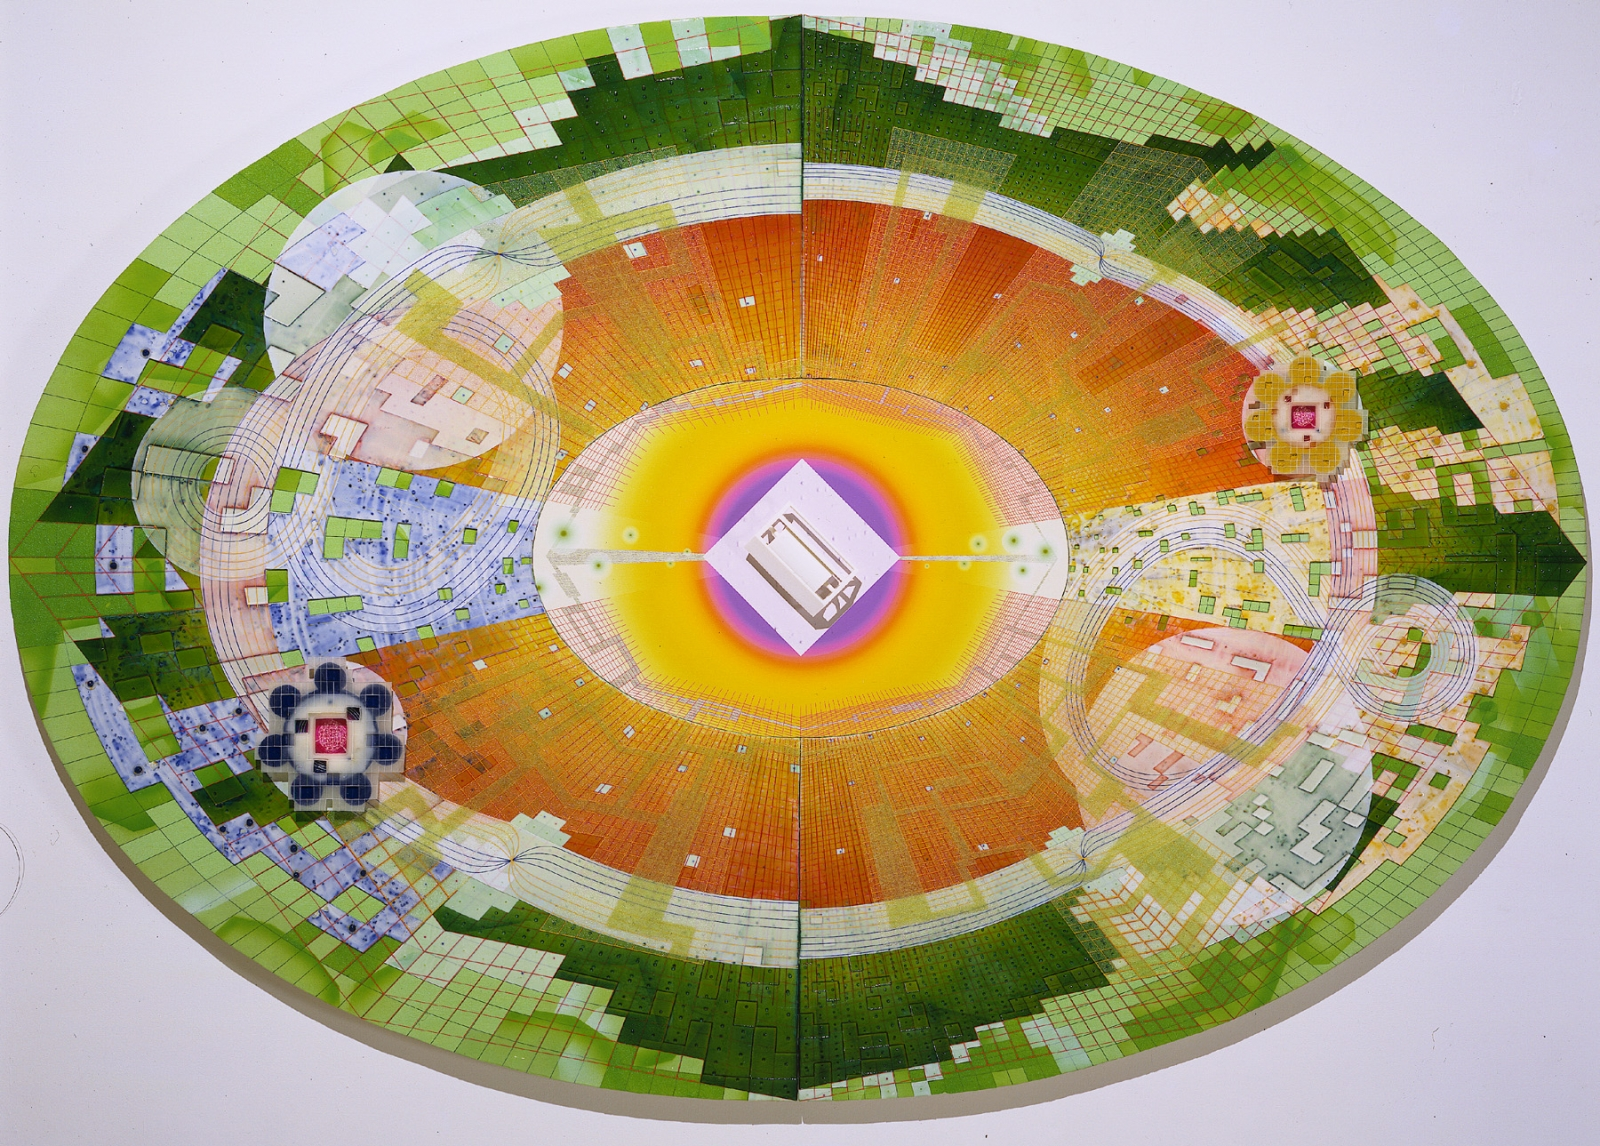 PEDRO BARBEITO, Super Collider: Quark-Gluon, 2000